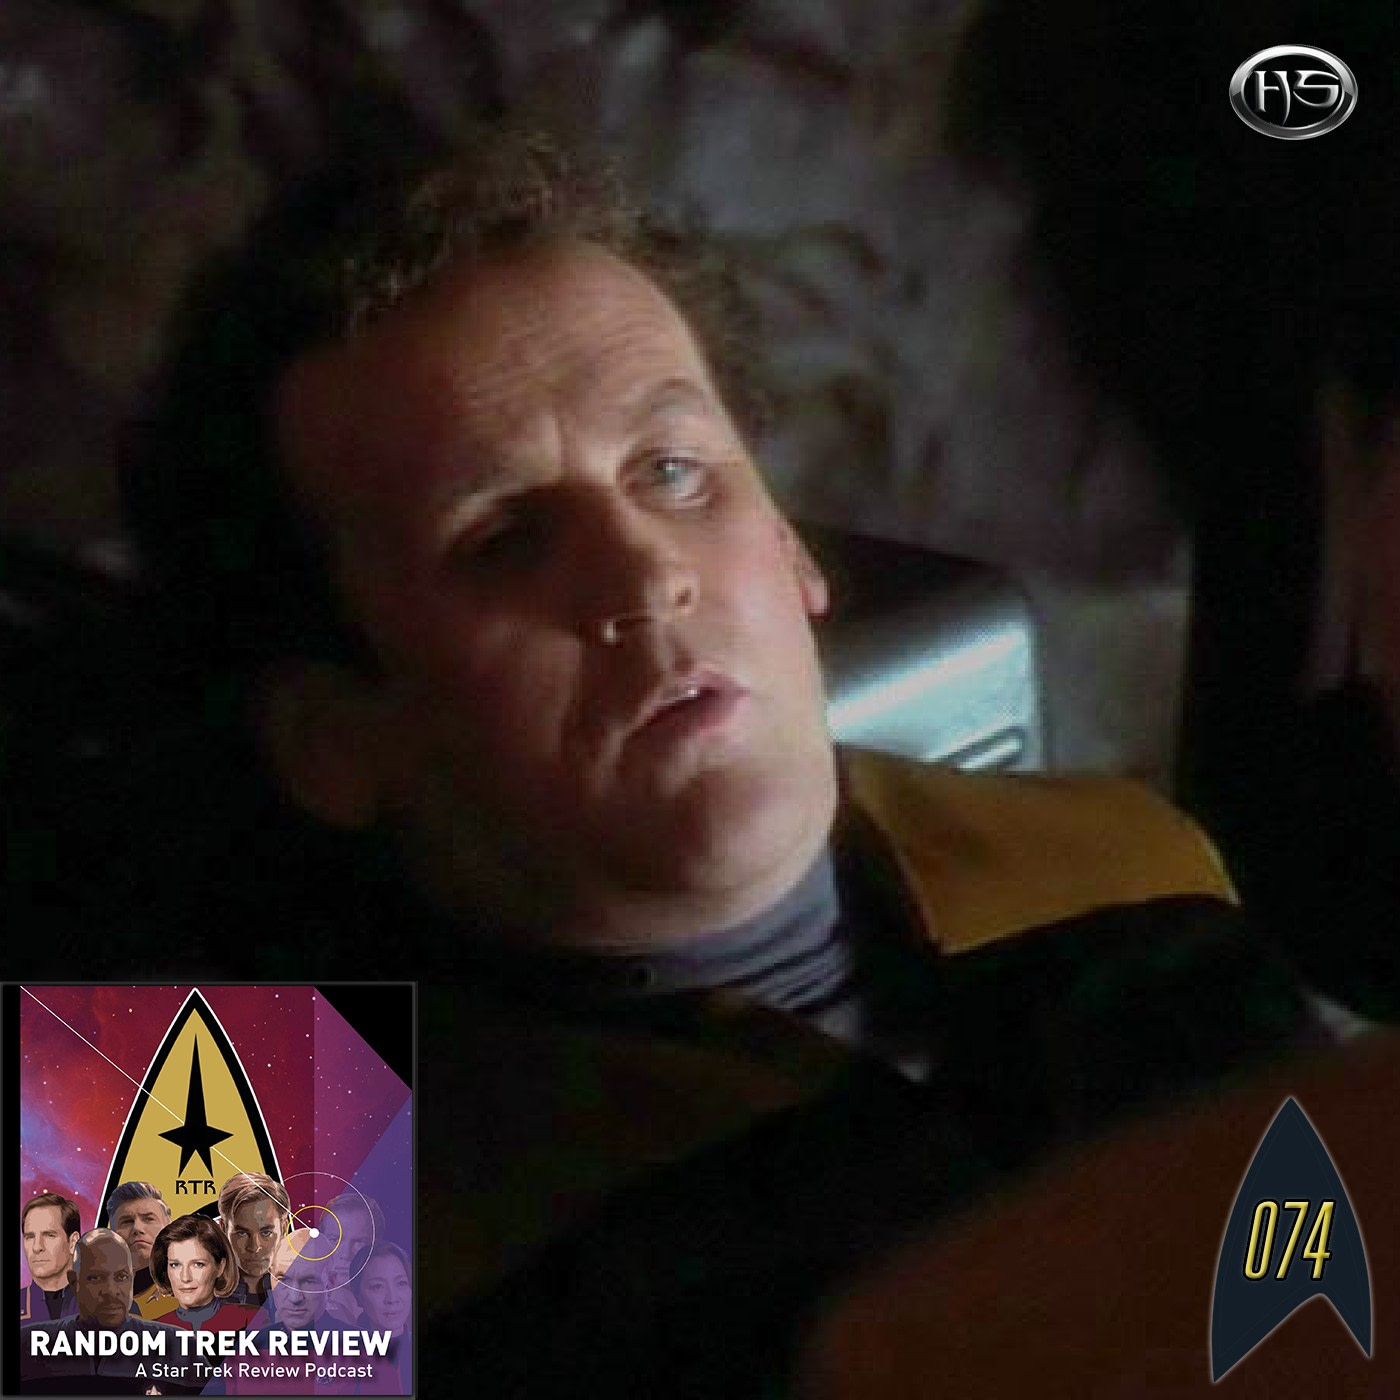 Random Trek Review Episode 74